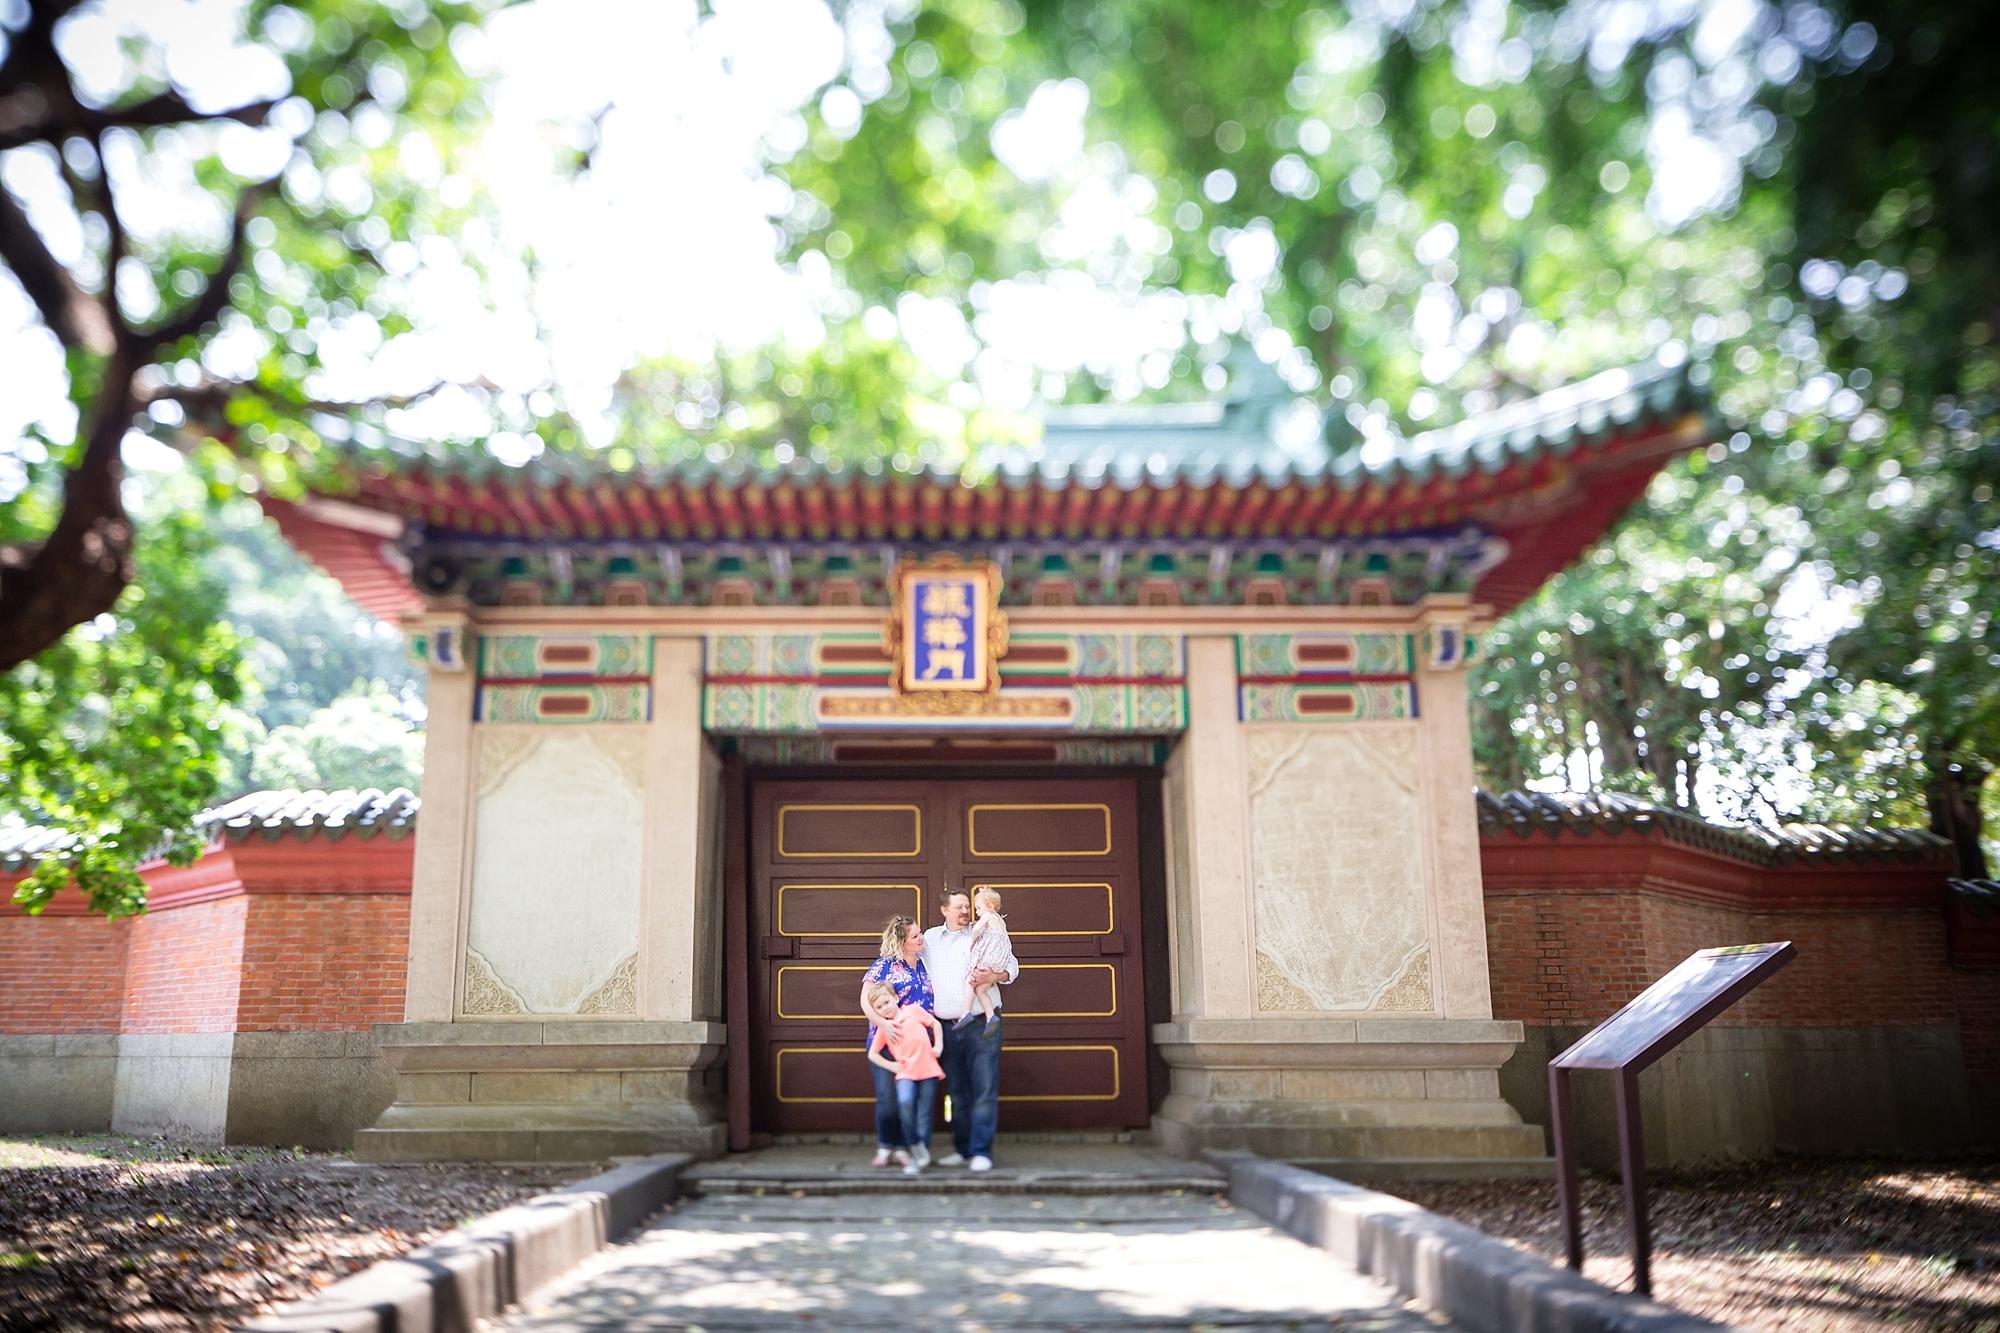 Outdoor_Lifestyle_Family_Photos_Taiwan_Hunnicutt_Photography_0031